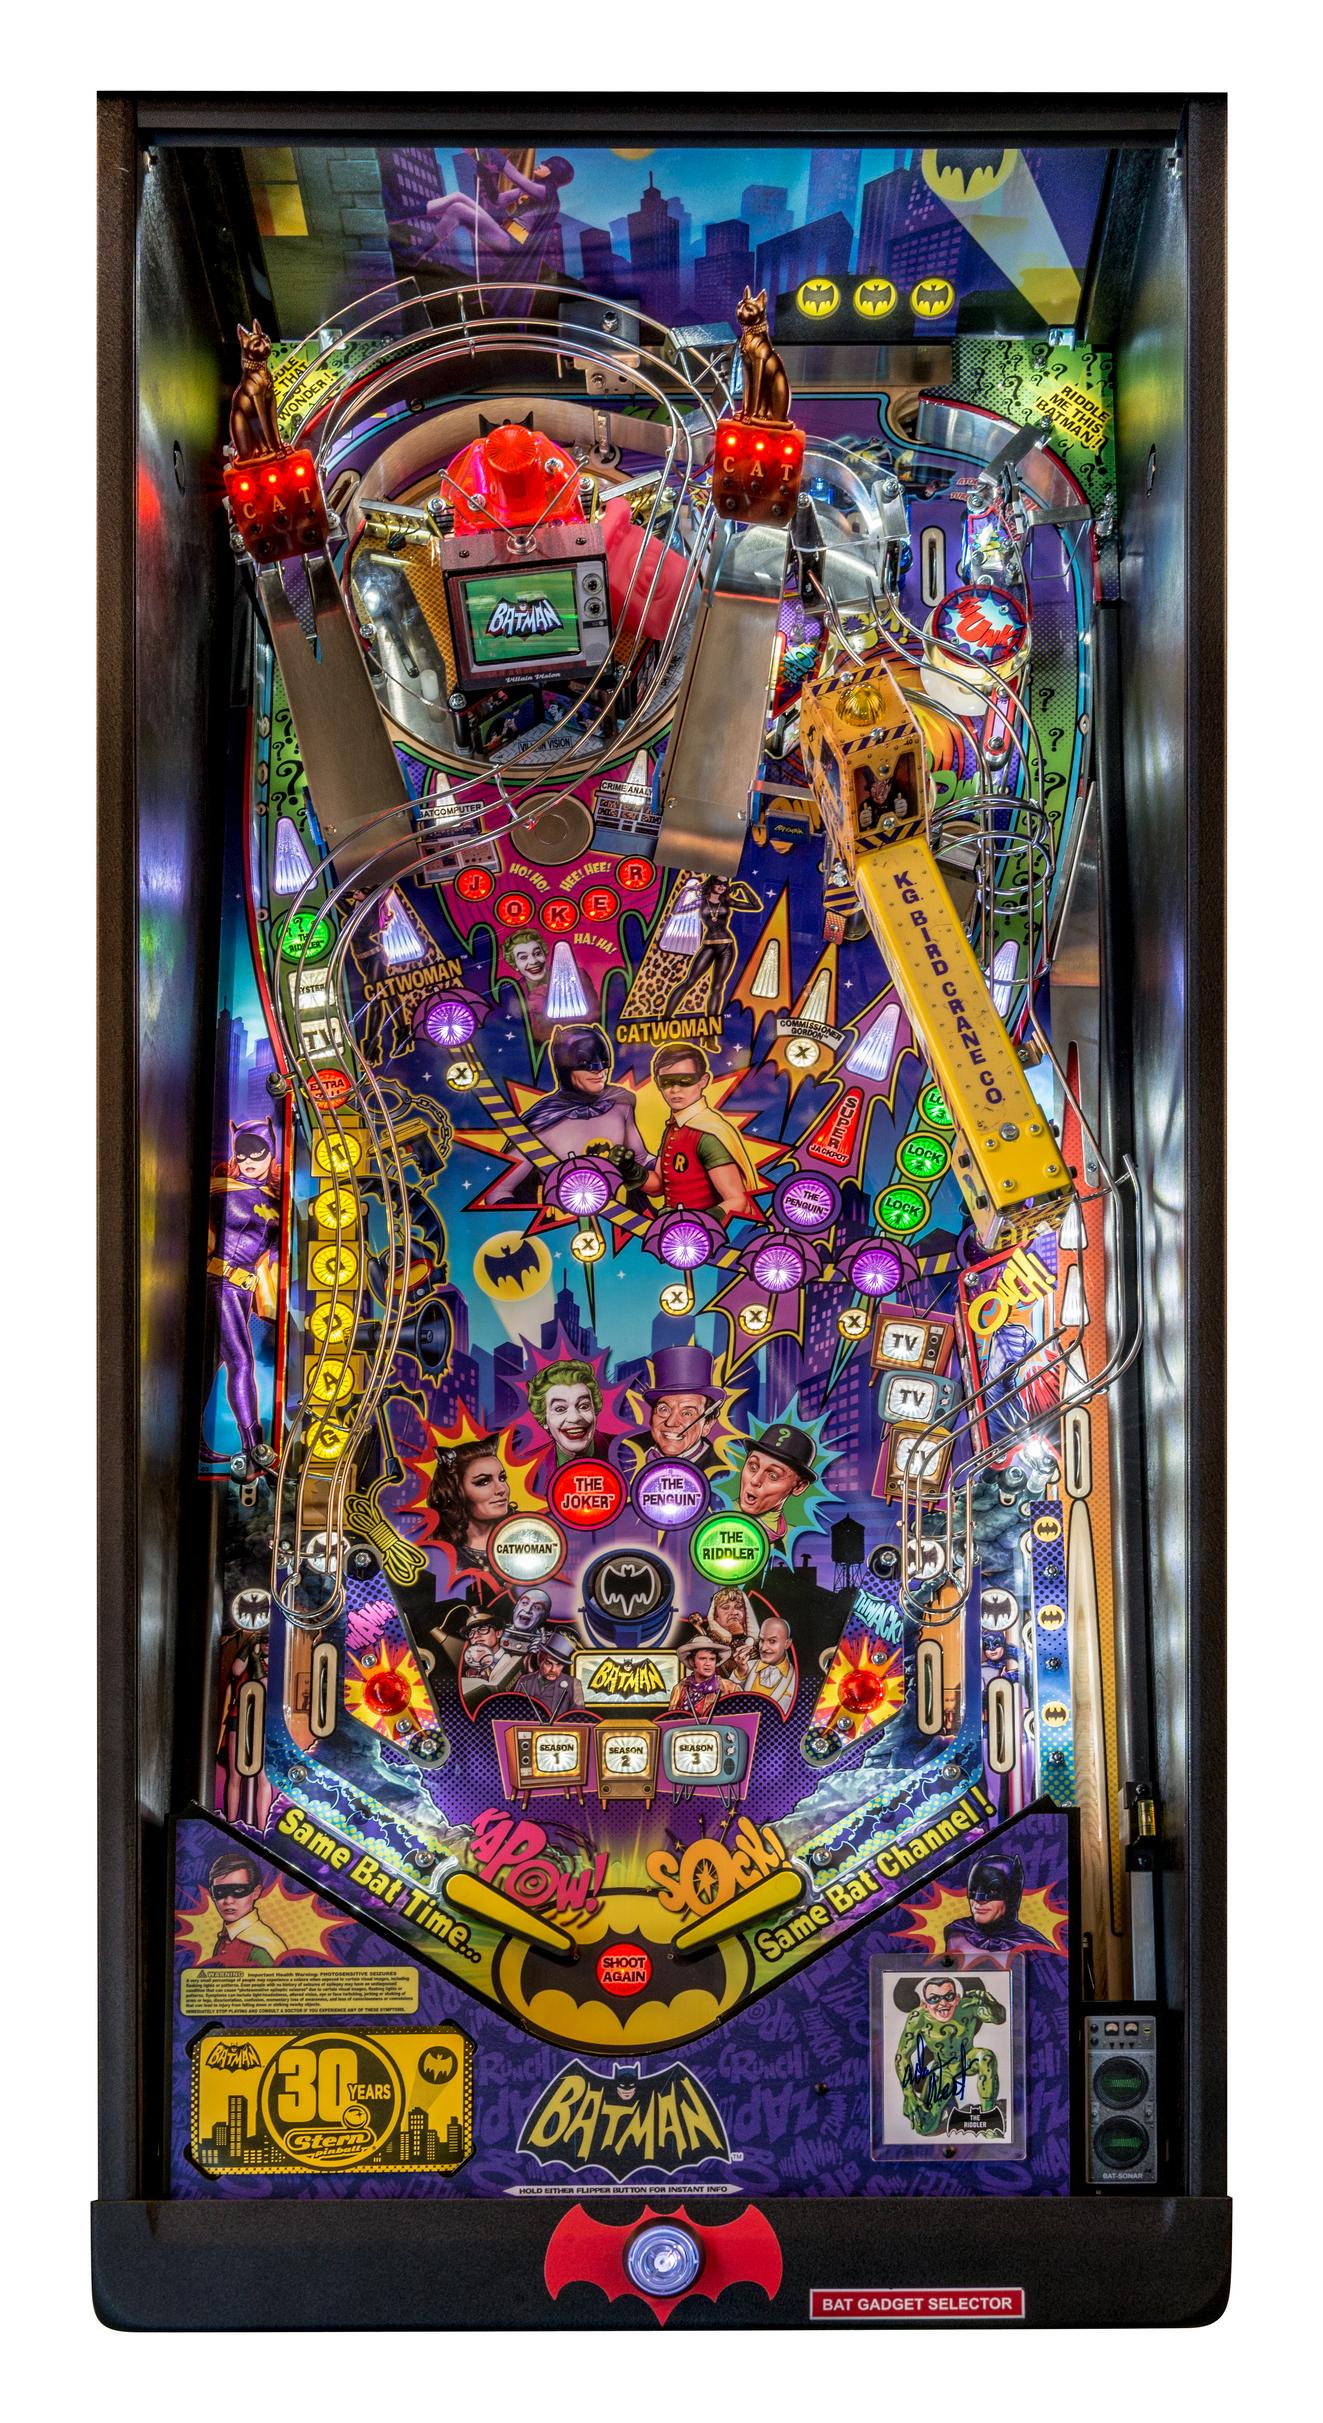 Batman 66 Pinball Machine by Stern Pinball